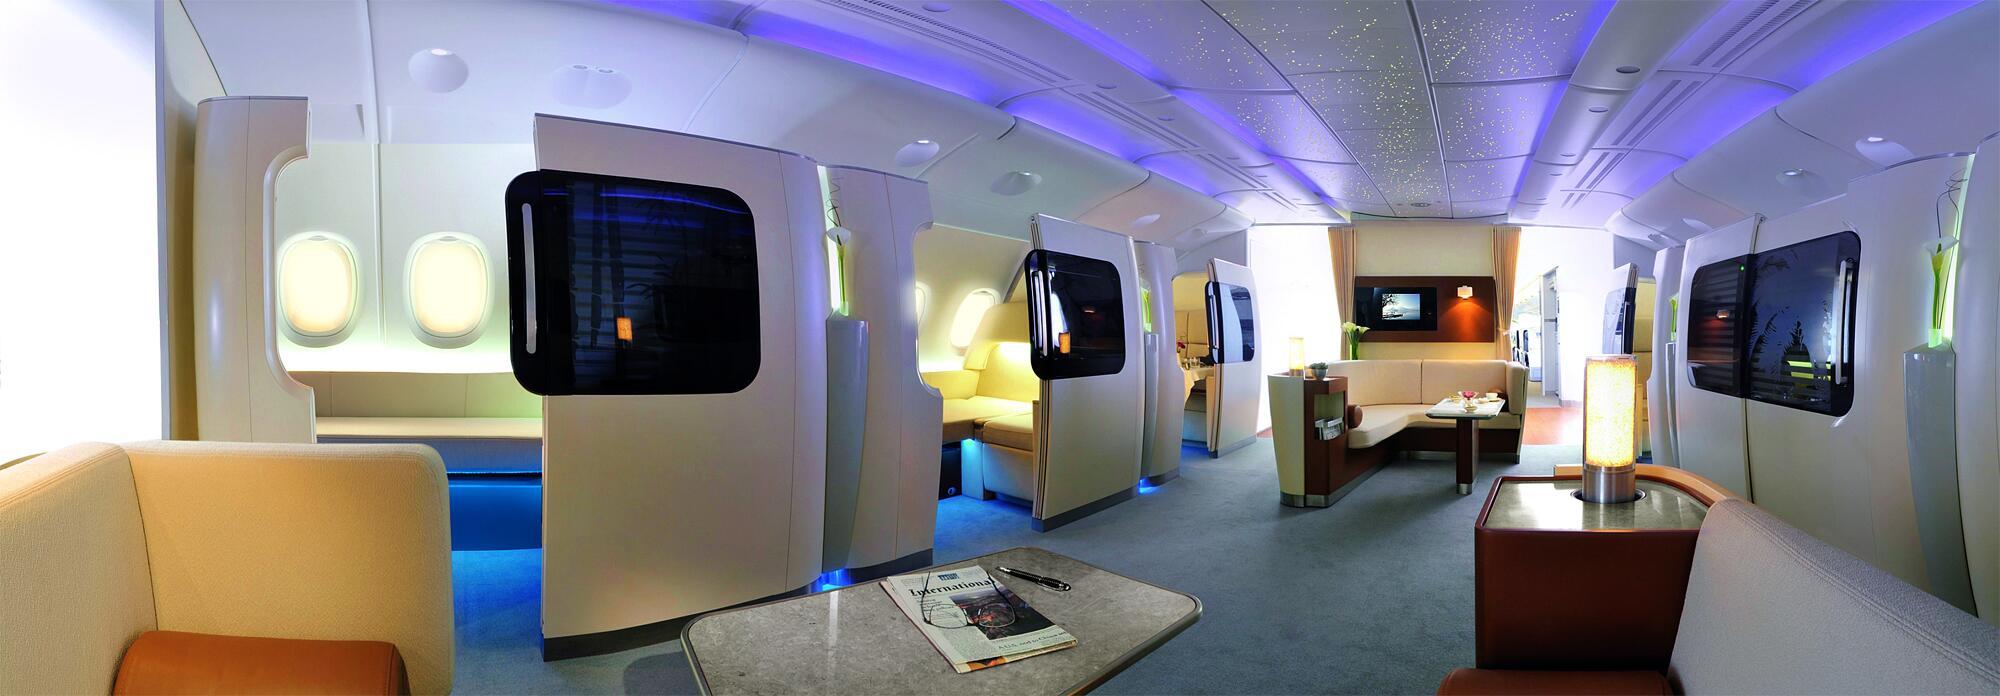 Bild zu Airbus A380 Interieur